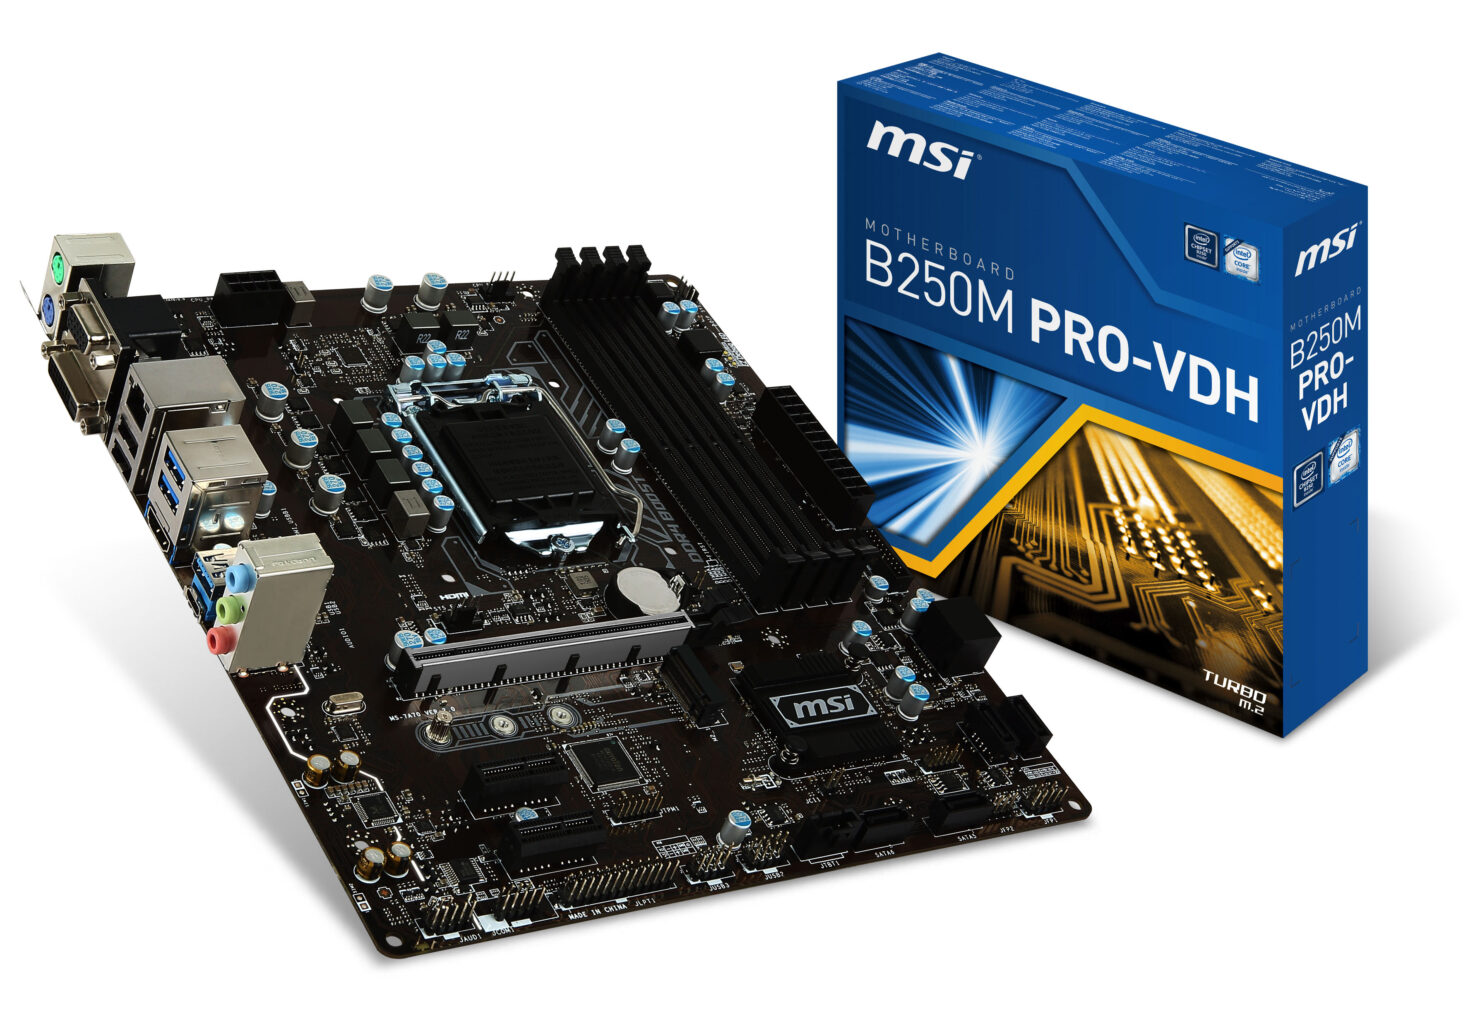 msi-b250m_pro_vdh-product_picture-box